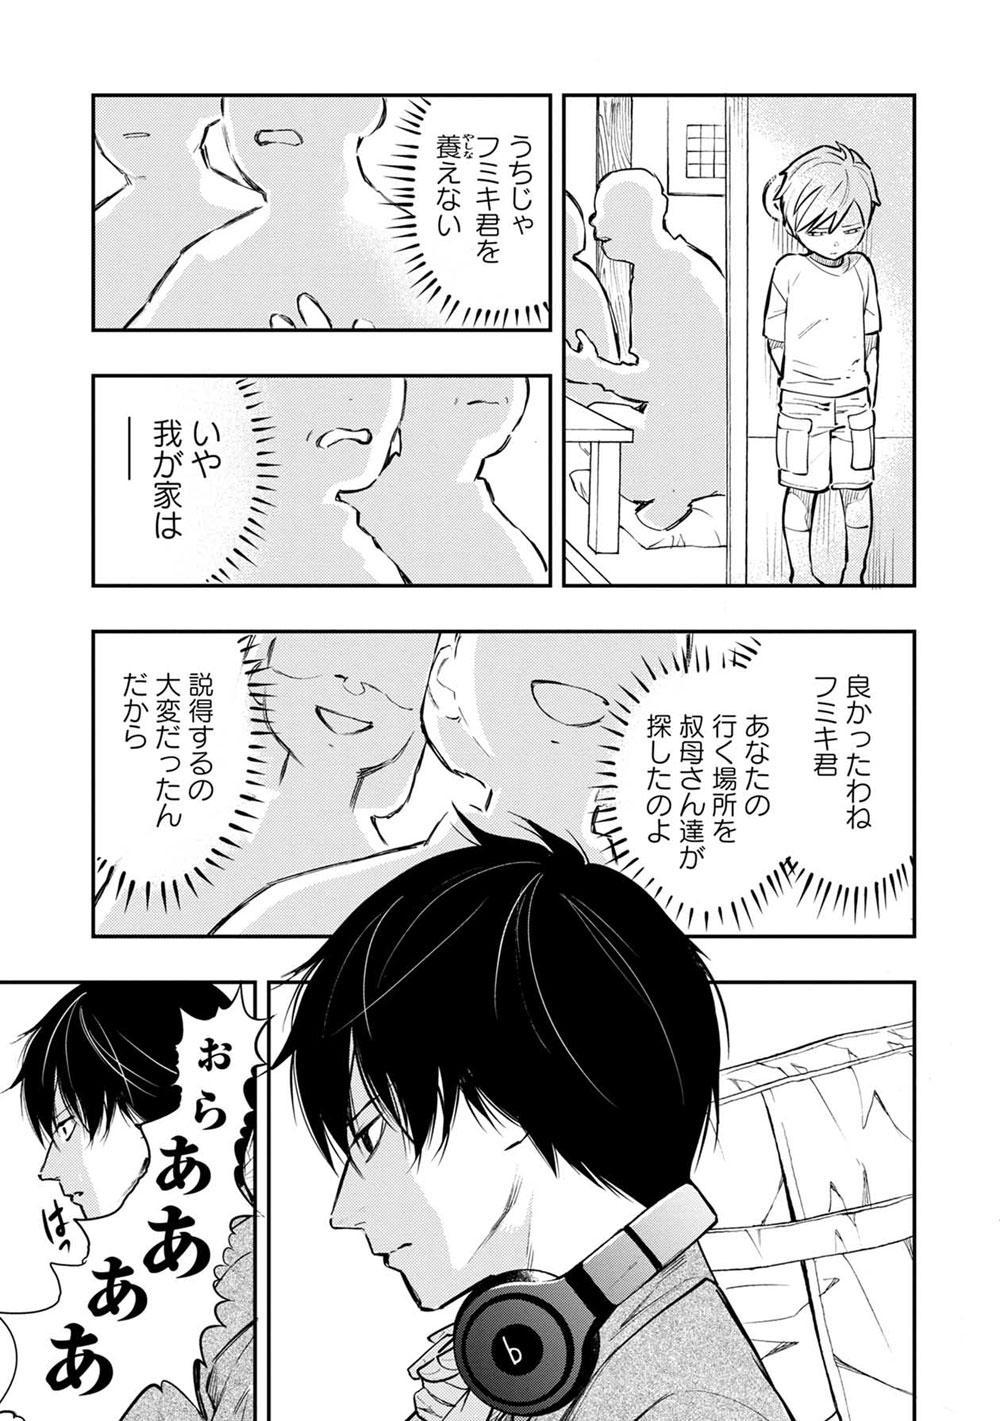 inugami_re_002_004.jpg